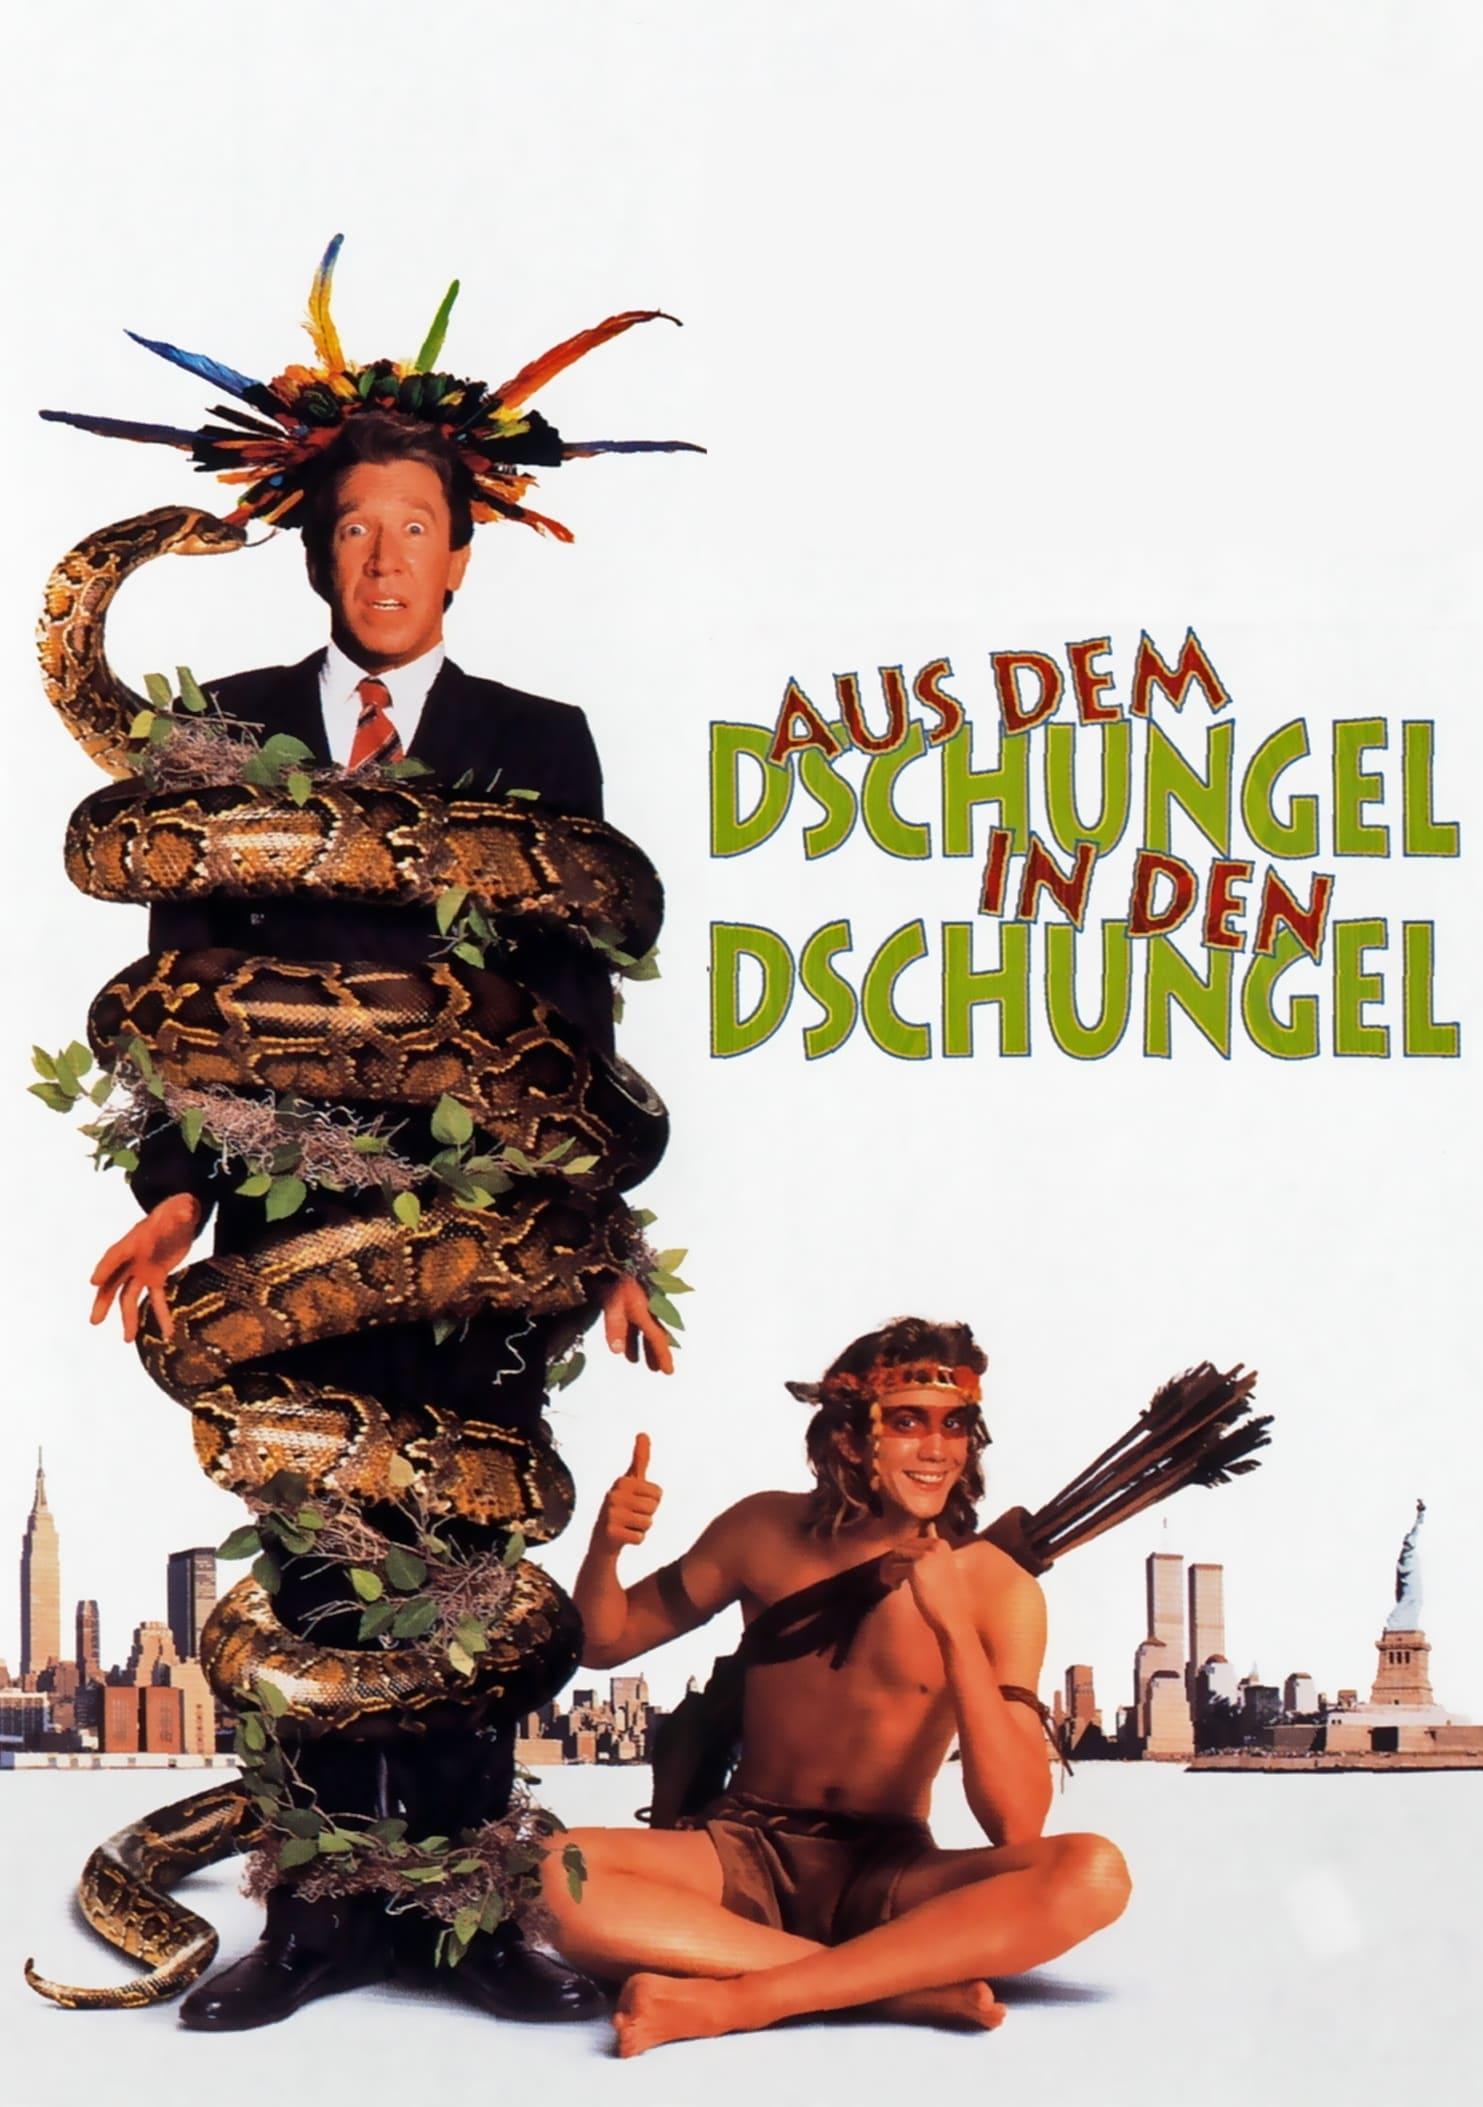 Jungle 2 Jungle 1997 - Movie Moviefone